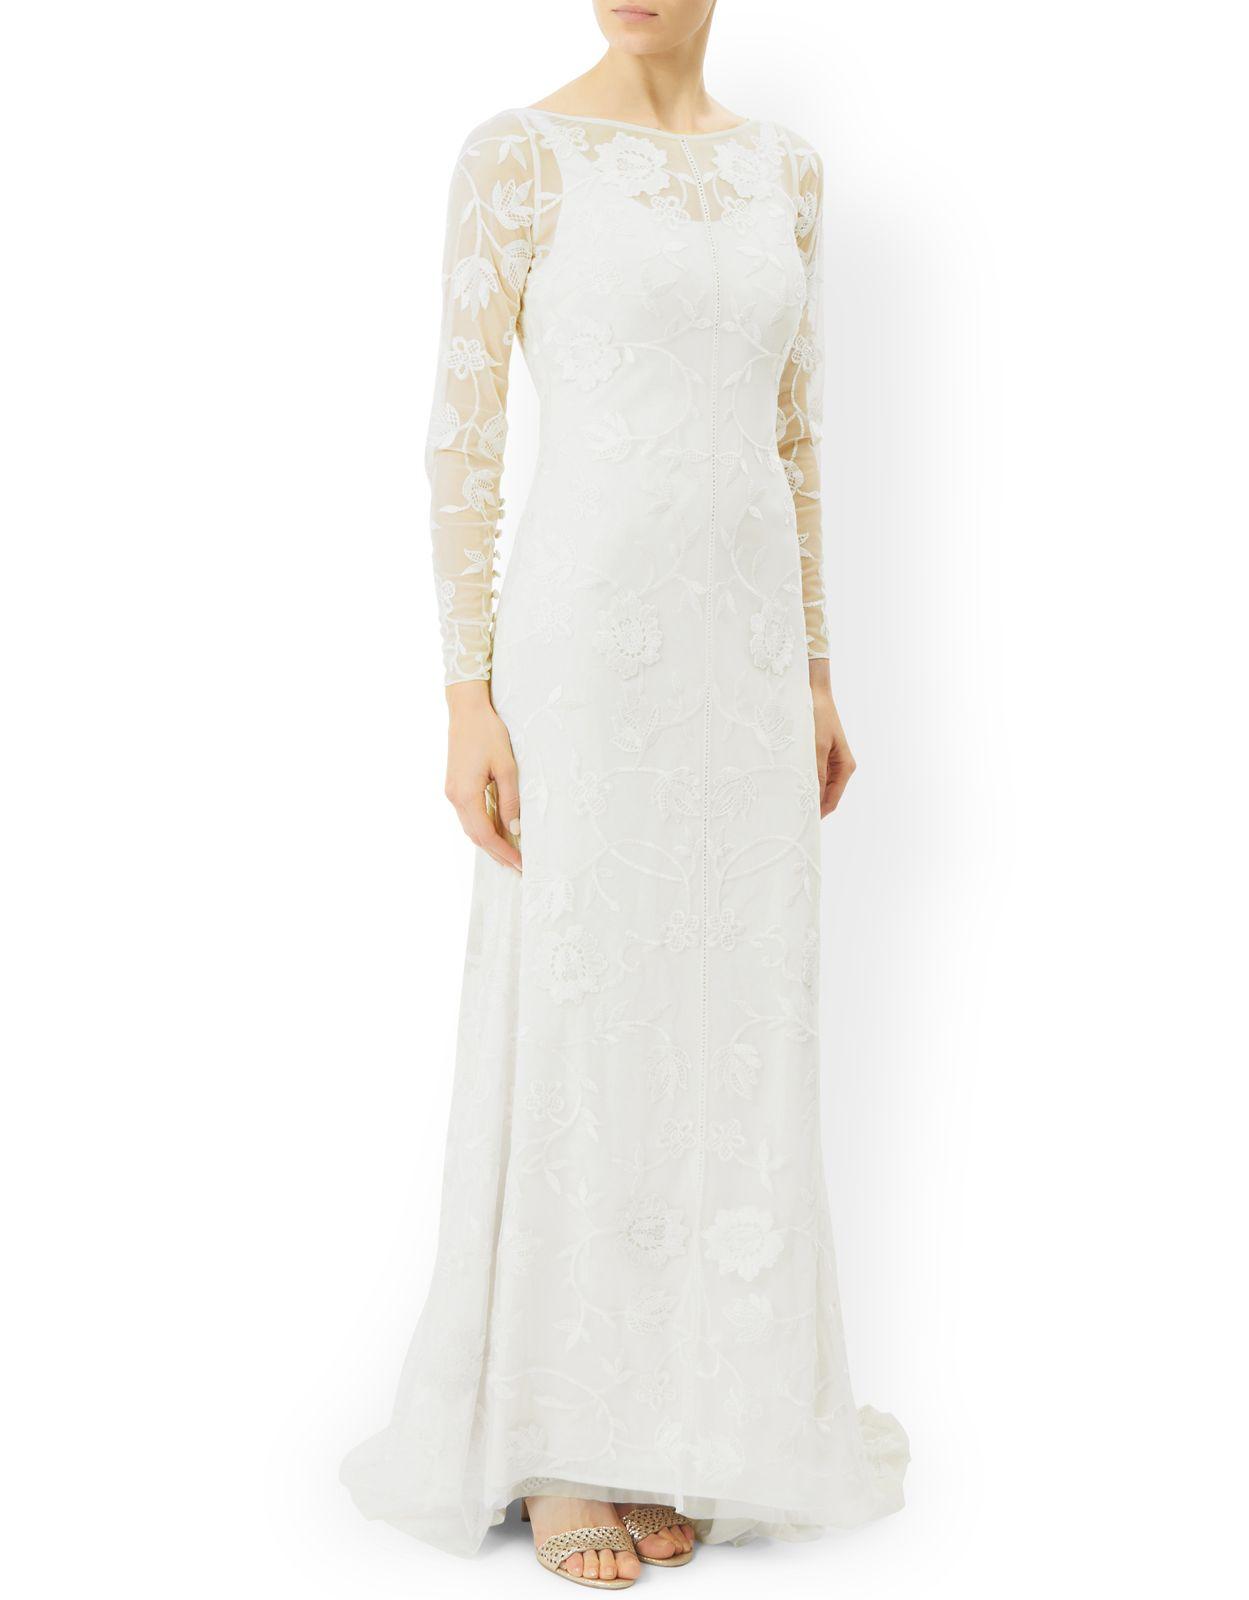 Gianna Bridal Dress Ivory Monsoon High Street Wedding Dresses Amazing Wedding Dress Dresses